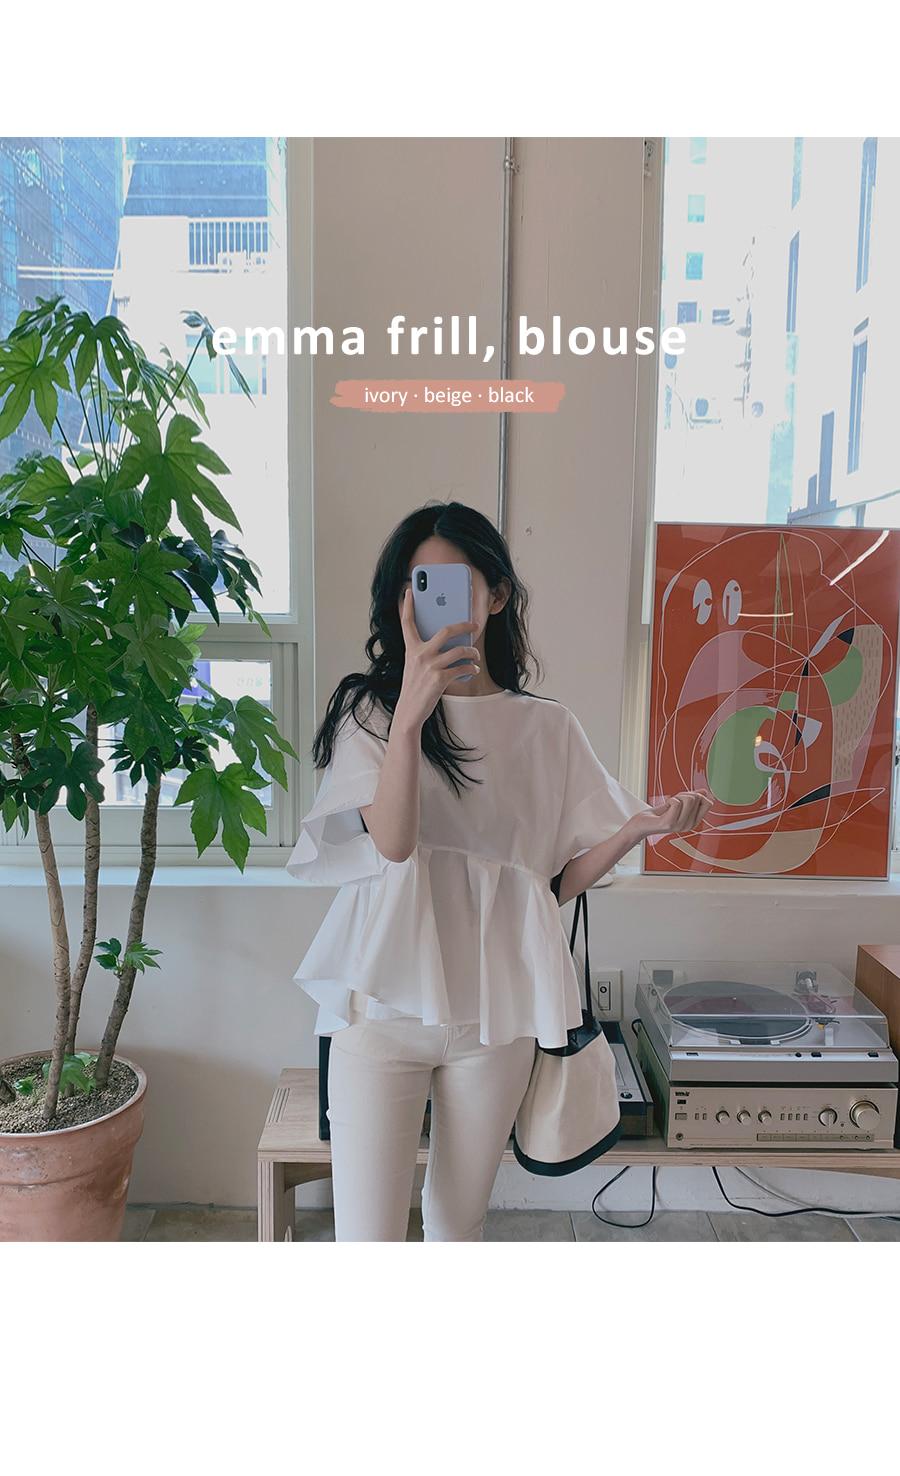 Emma frill blouse